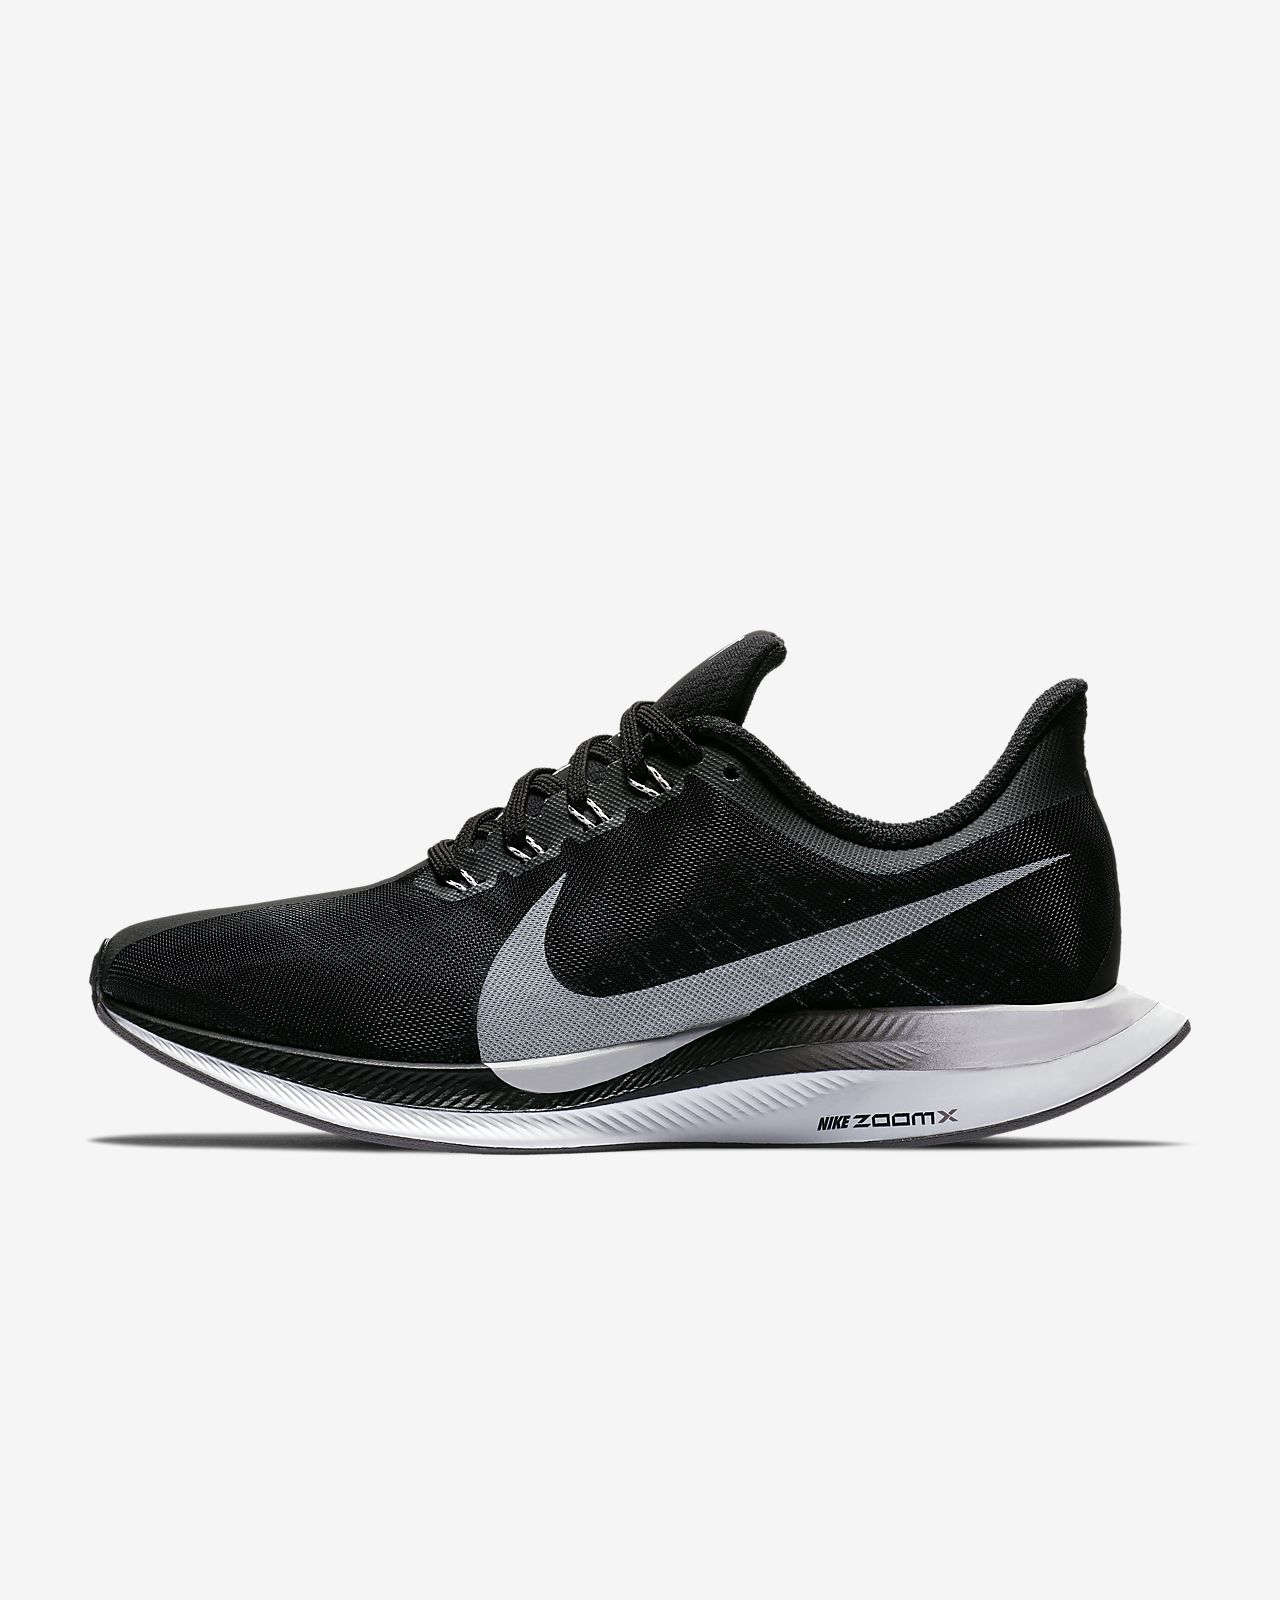 373d2f9aefb Nike Zoom Pegasus Turbo Zapatillas de running - Mujer. Nike.com ES